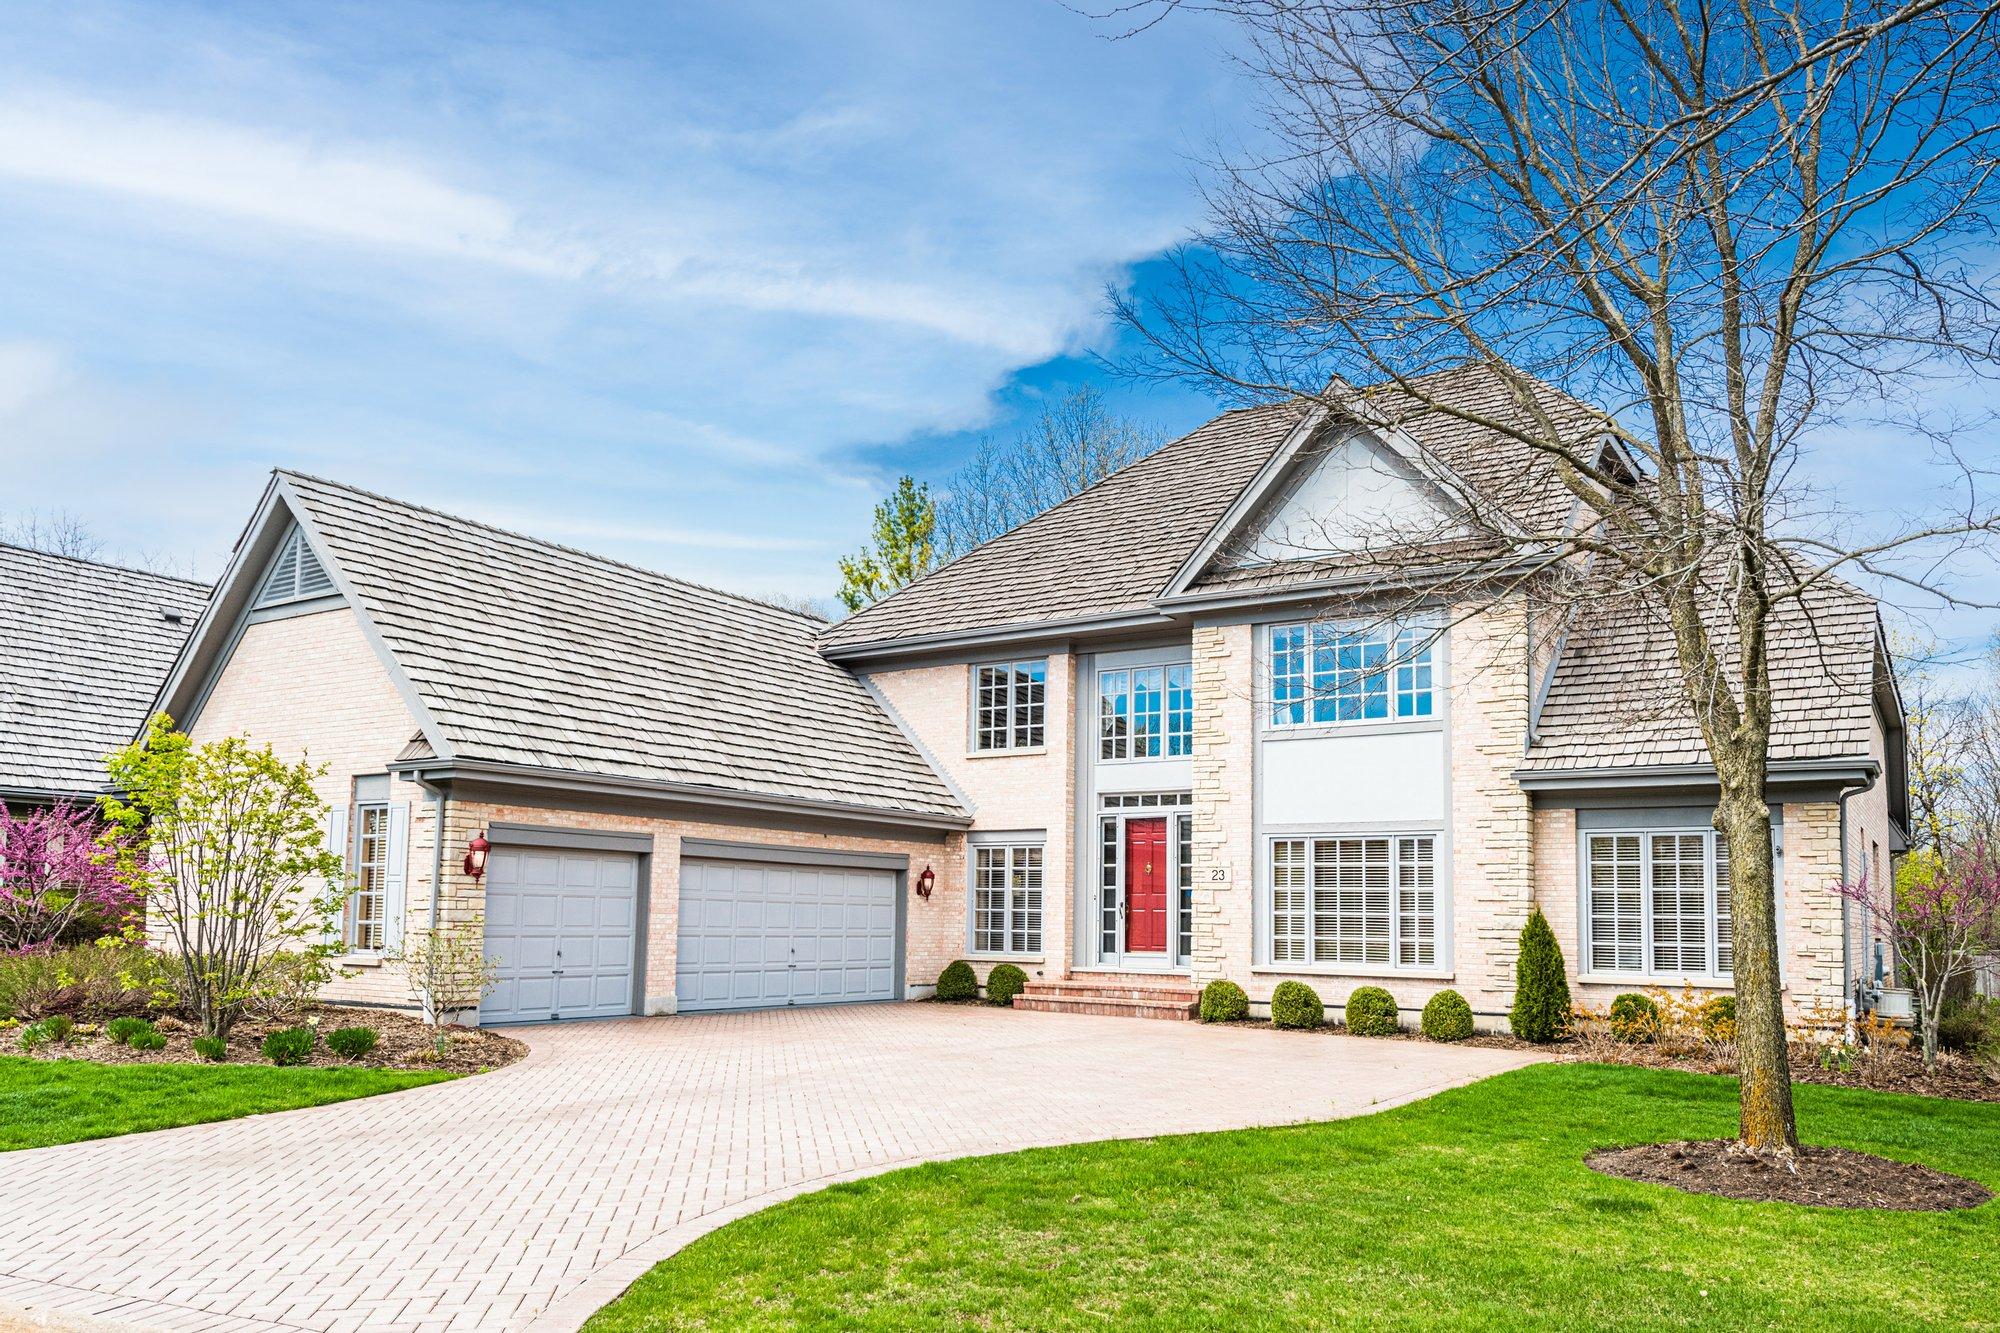 Casa a Barrington Hills, Illinois, Stati Uniti 1 - 11415327